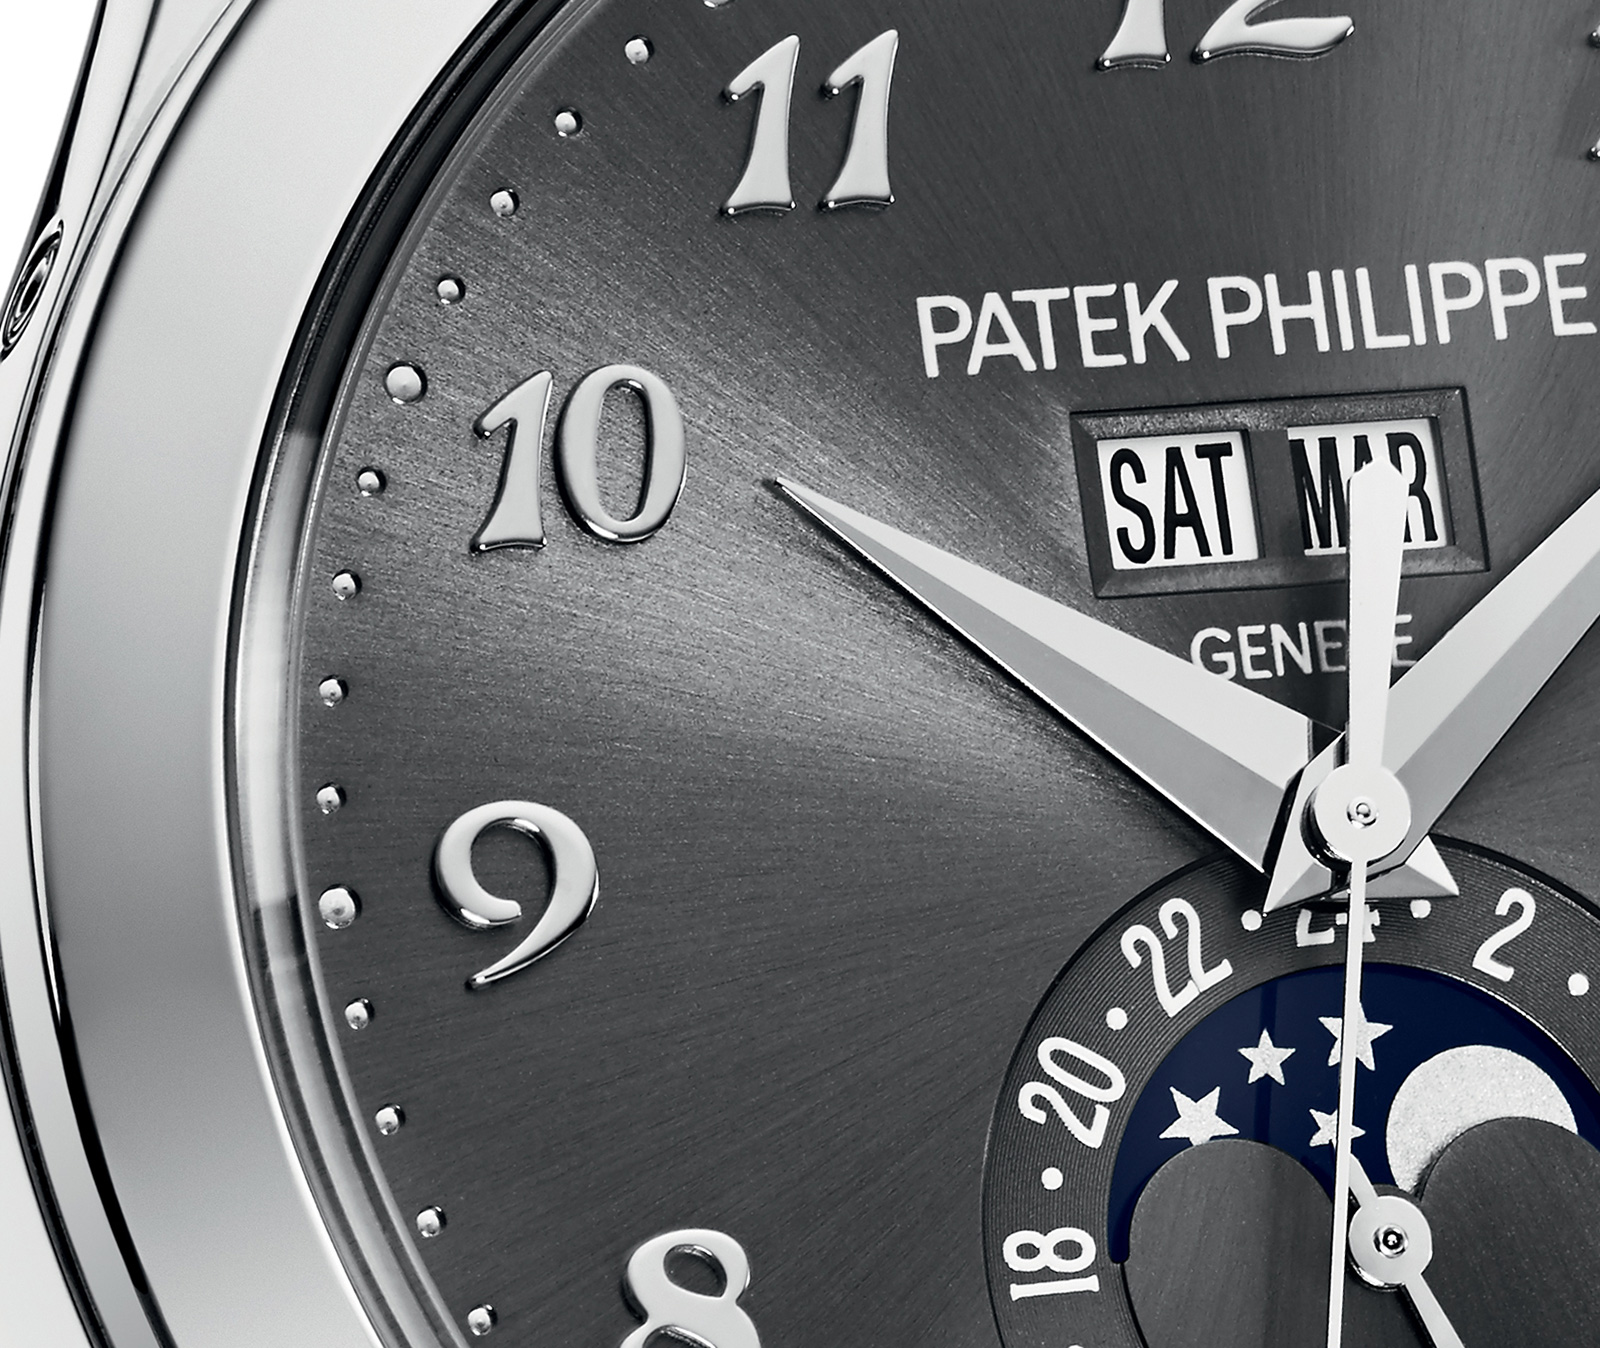 Patek Philippe Annual Calendar ref. 5396G-014 dial